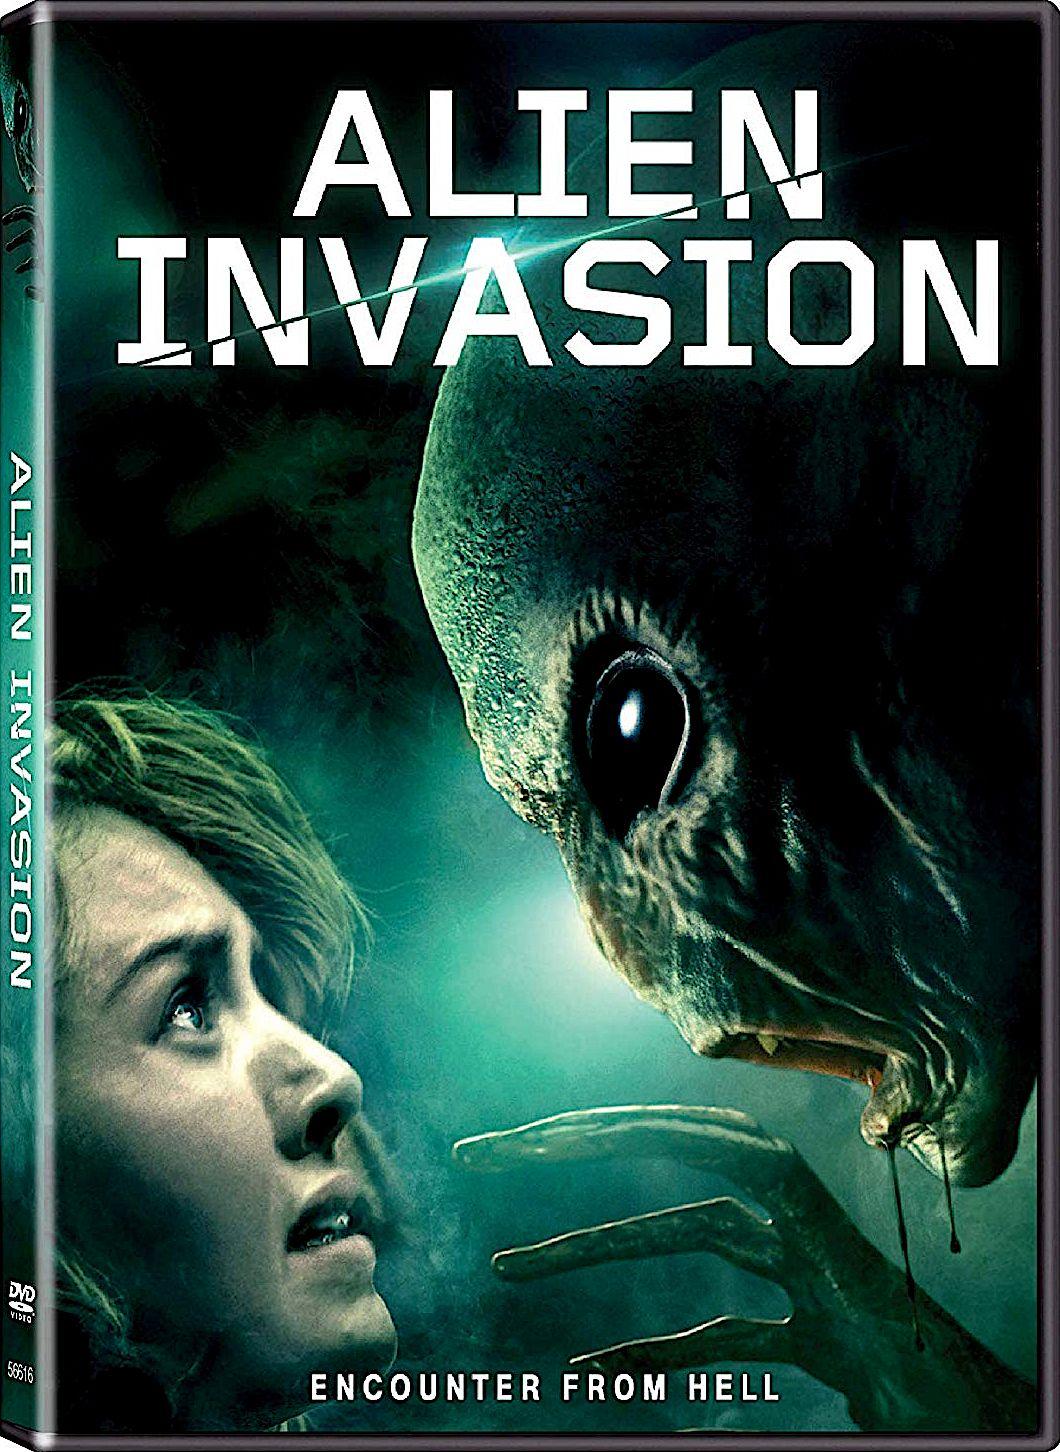 New Sci Fi Dvd Movie Releases: ALIEN INVASION DVD (LIONSGATE)